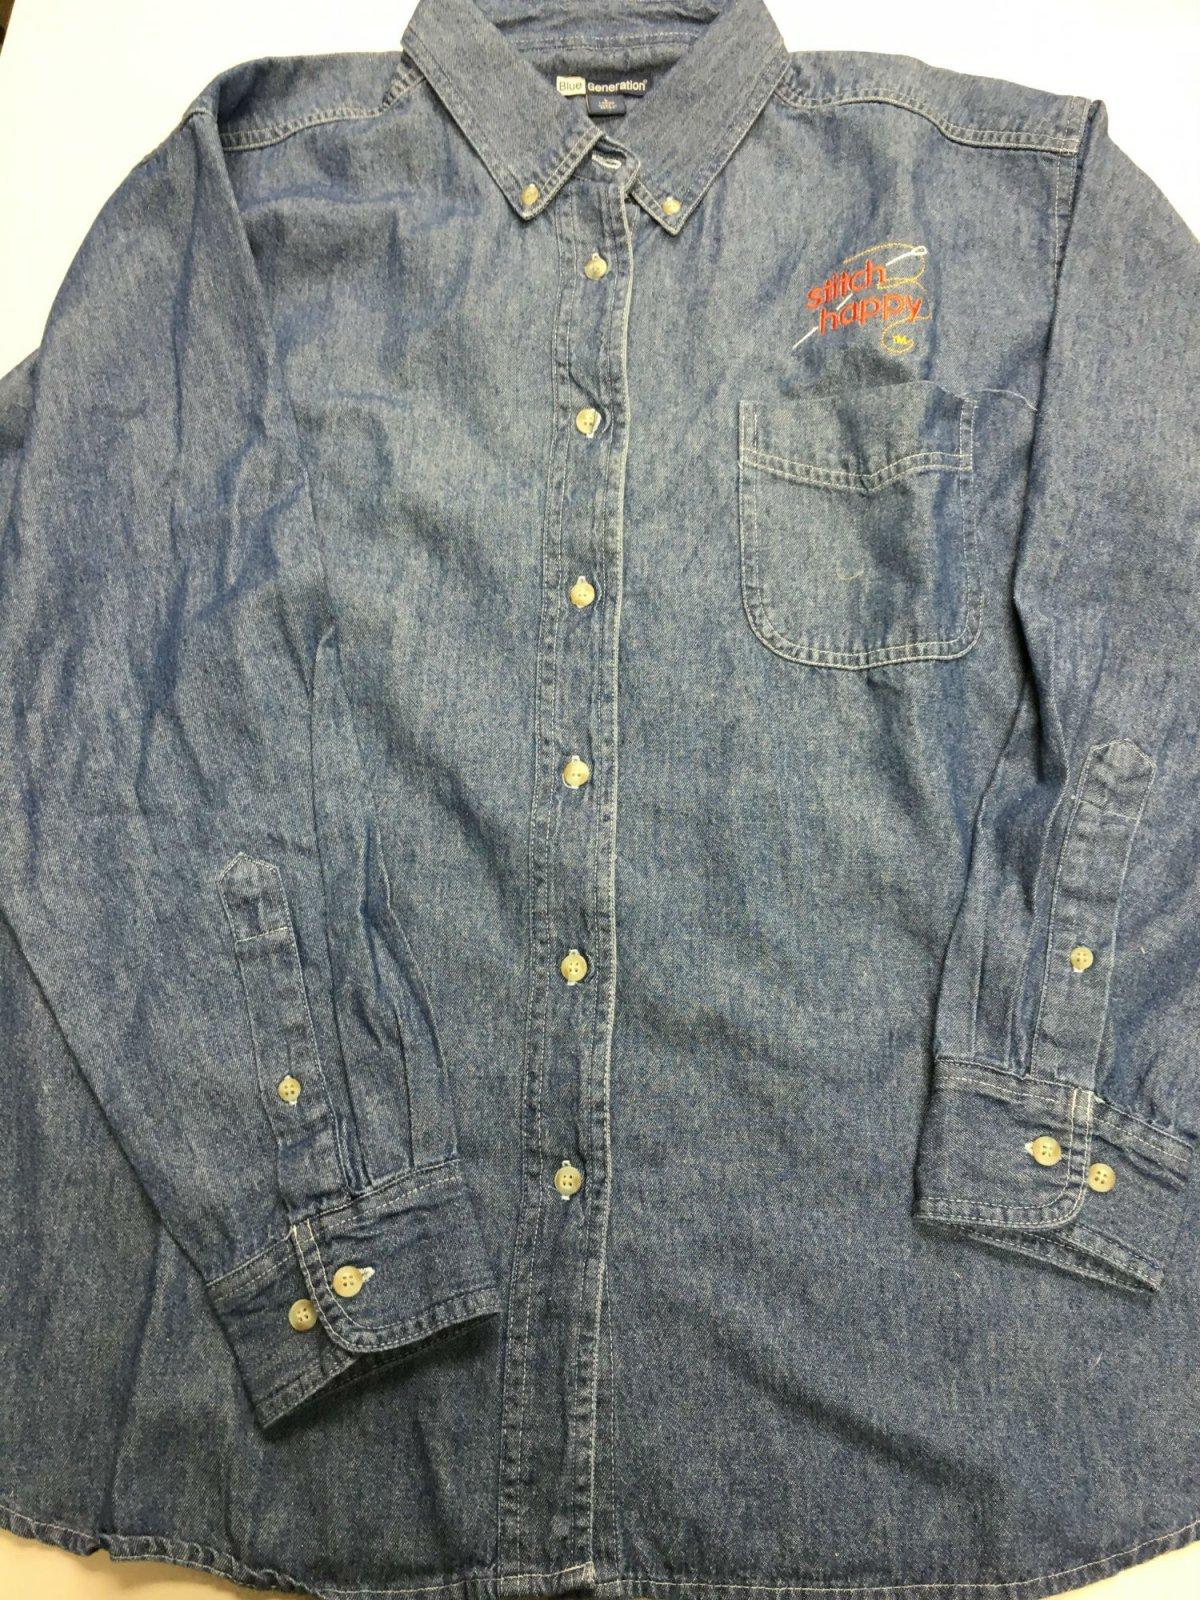 Stitch Happy denim shirt sz L